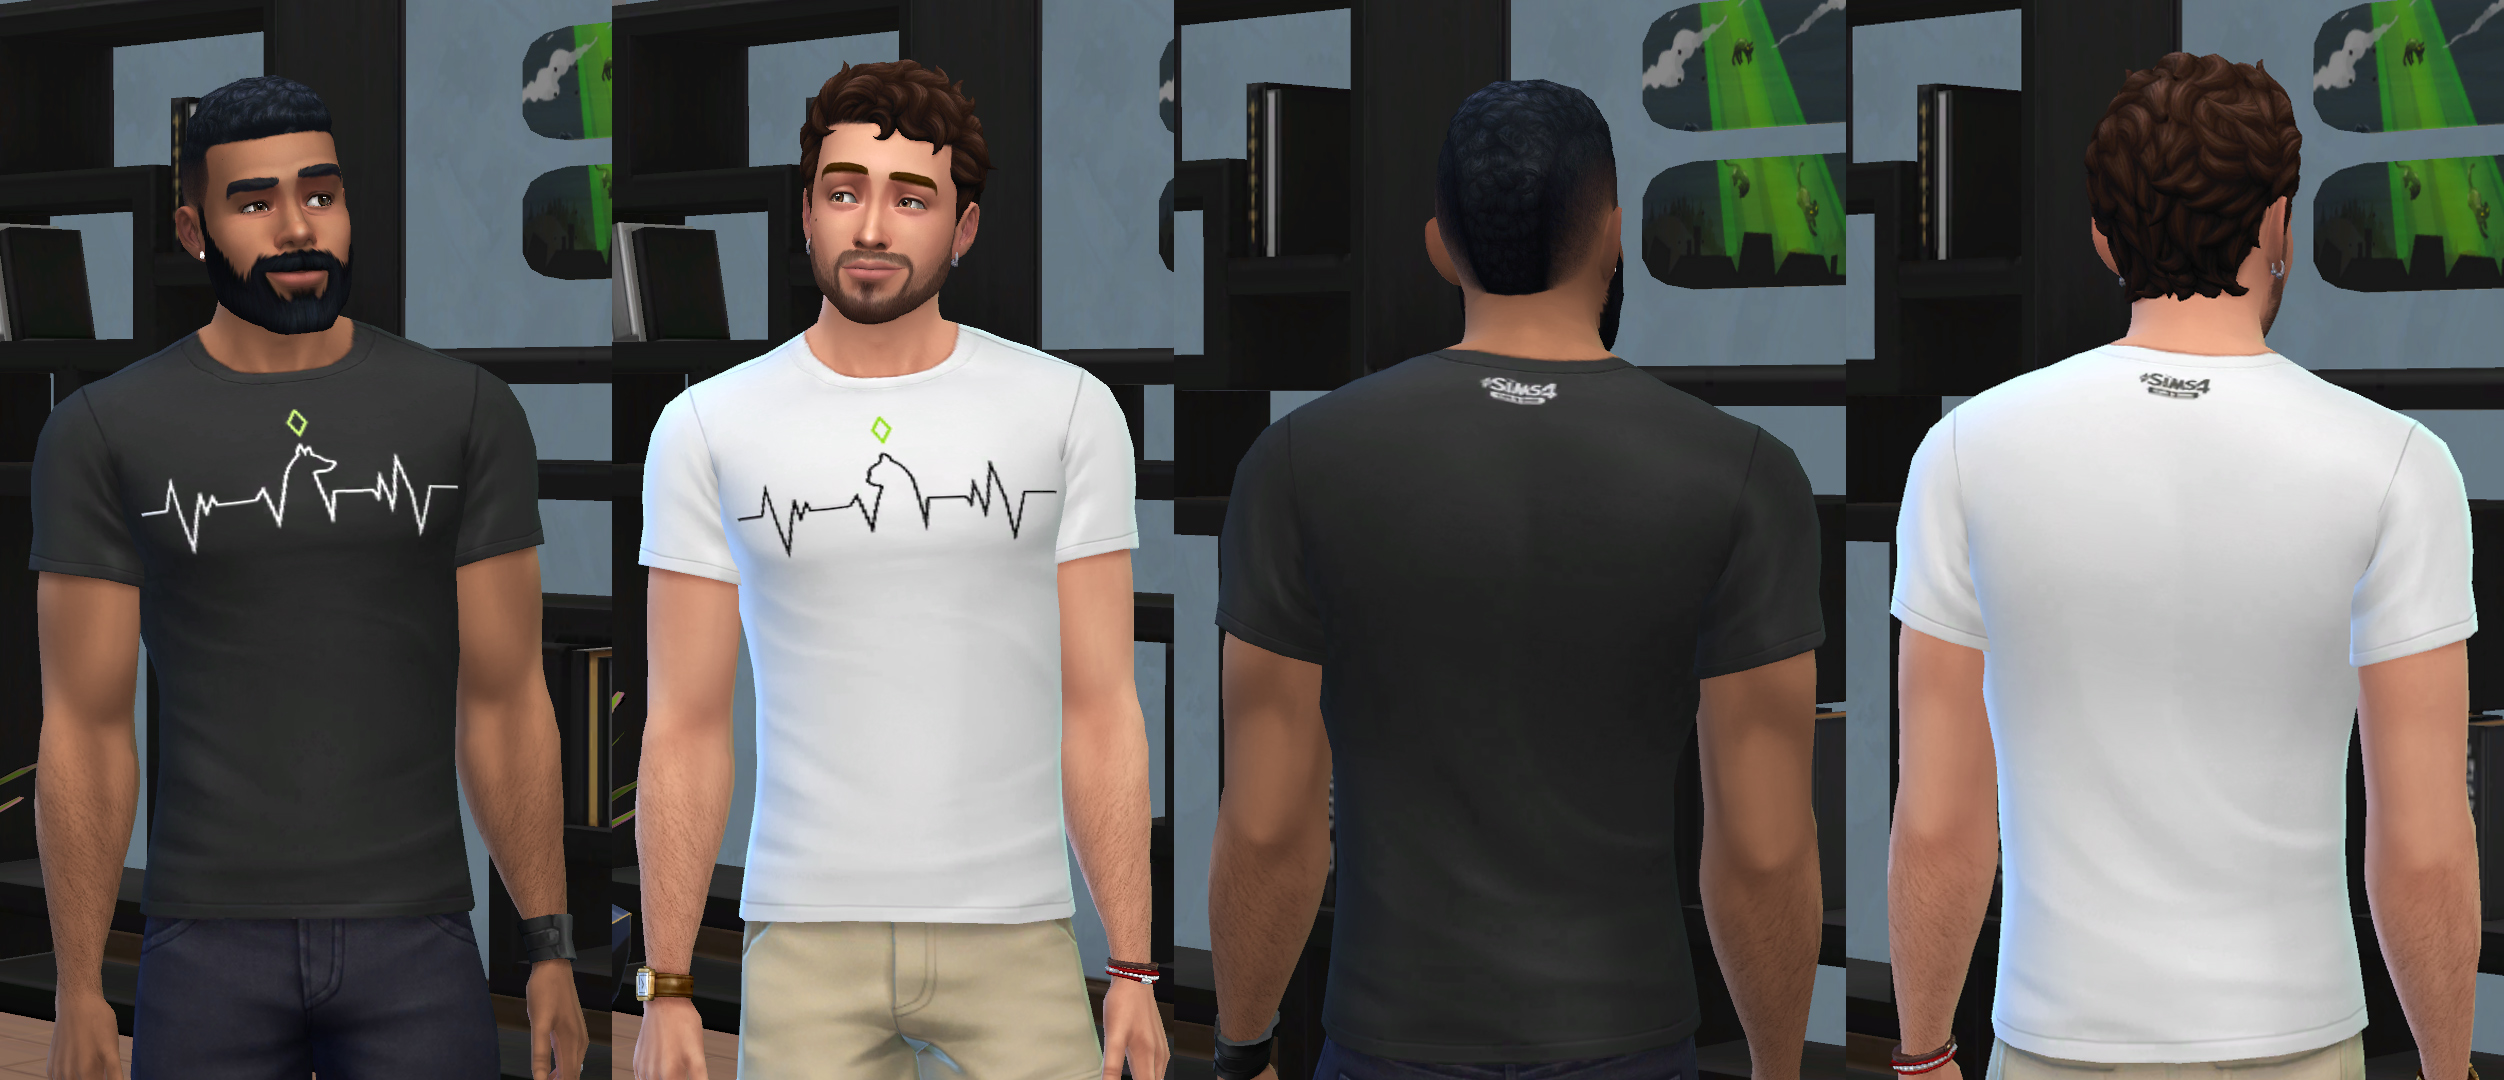 Sims 4 Cc Male Shirts - Nils Stucki Kieferorthopäde